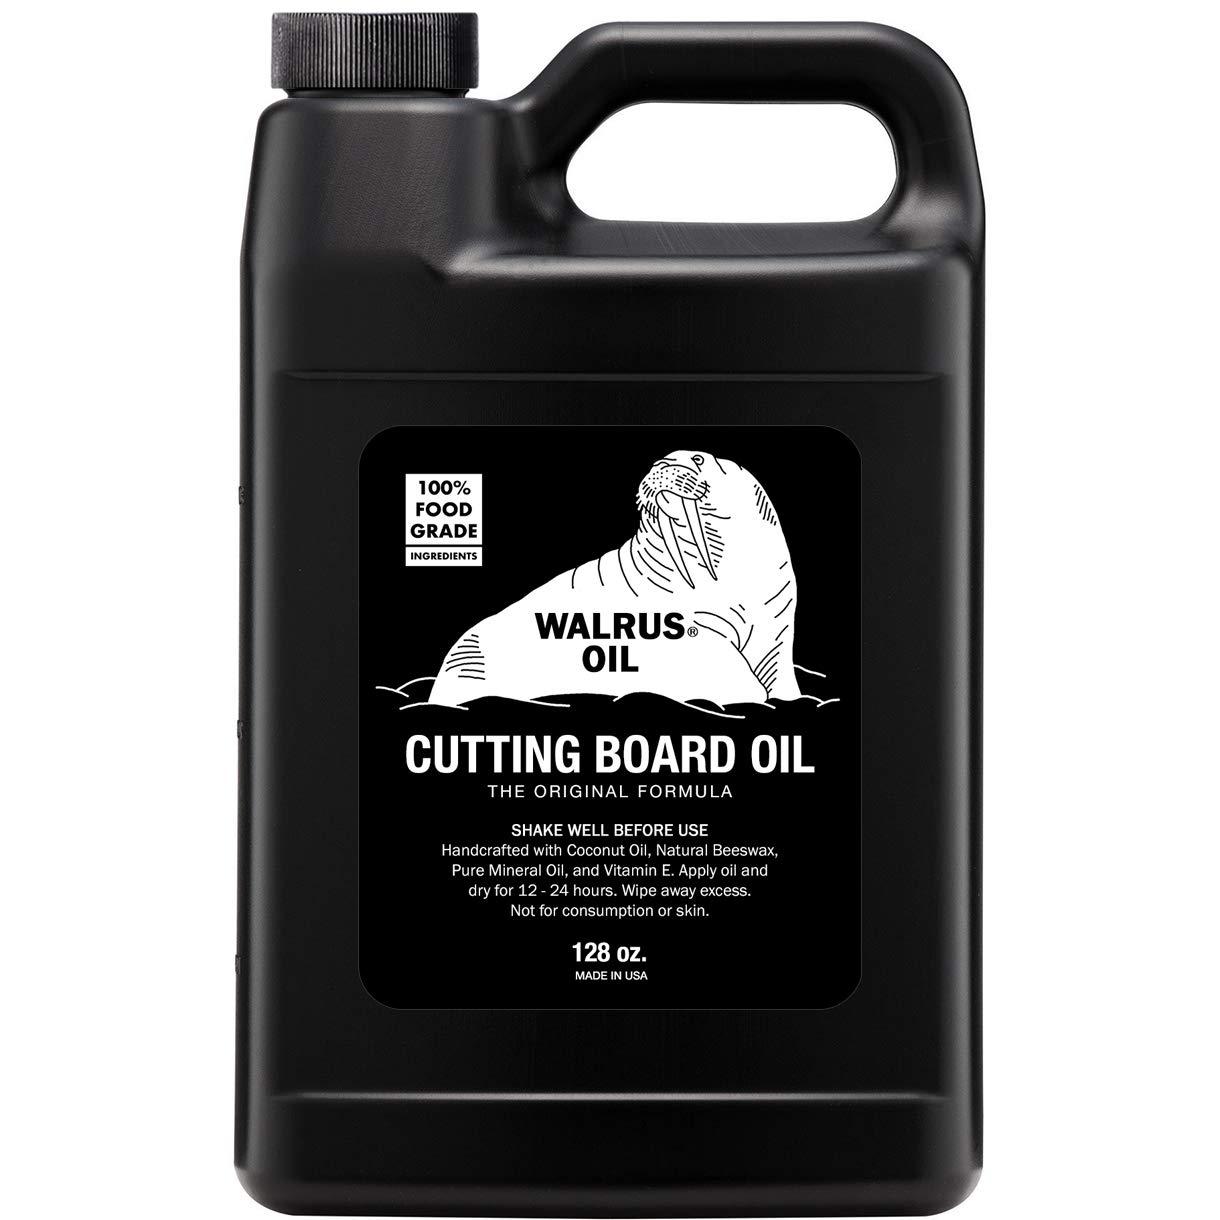 WALRUS OIL - Cutting Board Oil and Wood Butcher Block Oil, 128 oz / 1 gallon Jug